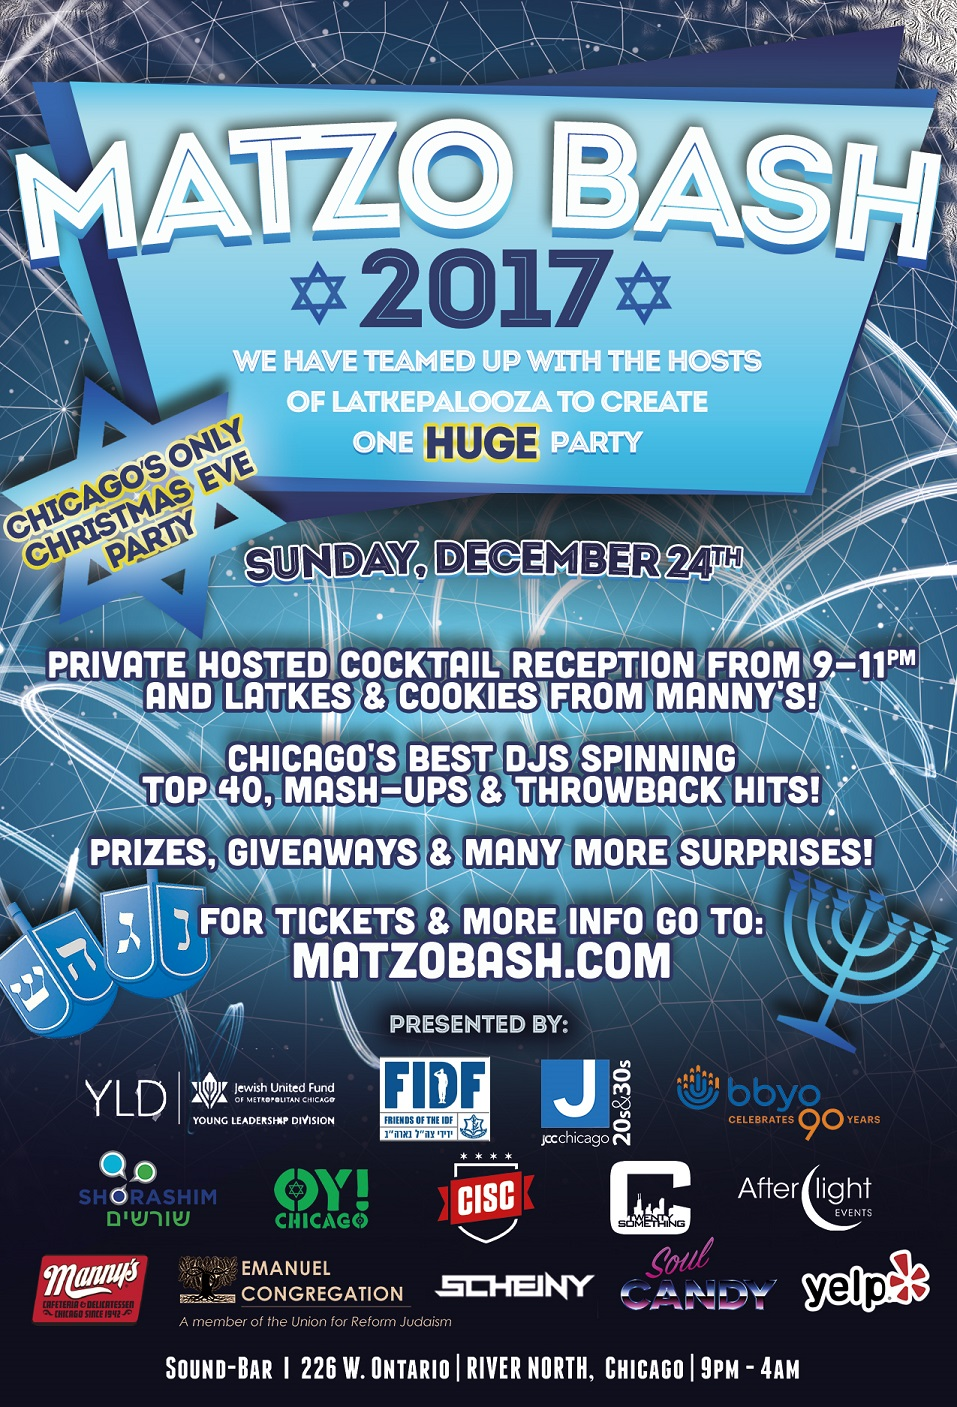 Matzobash 2017 Event Flyer!